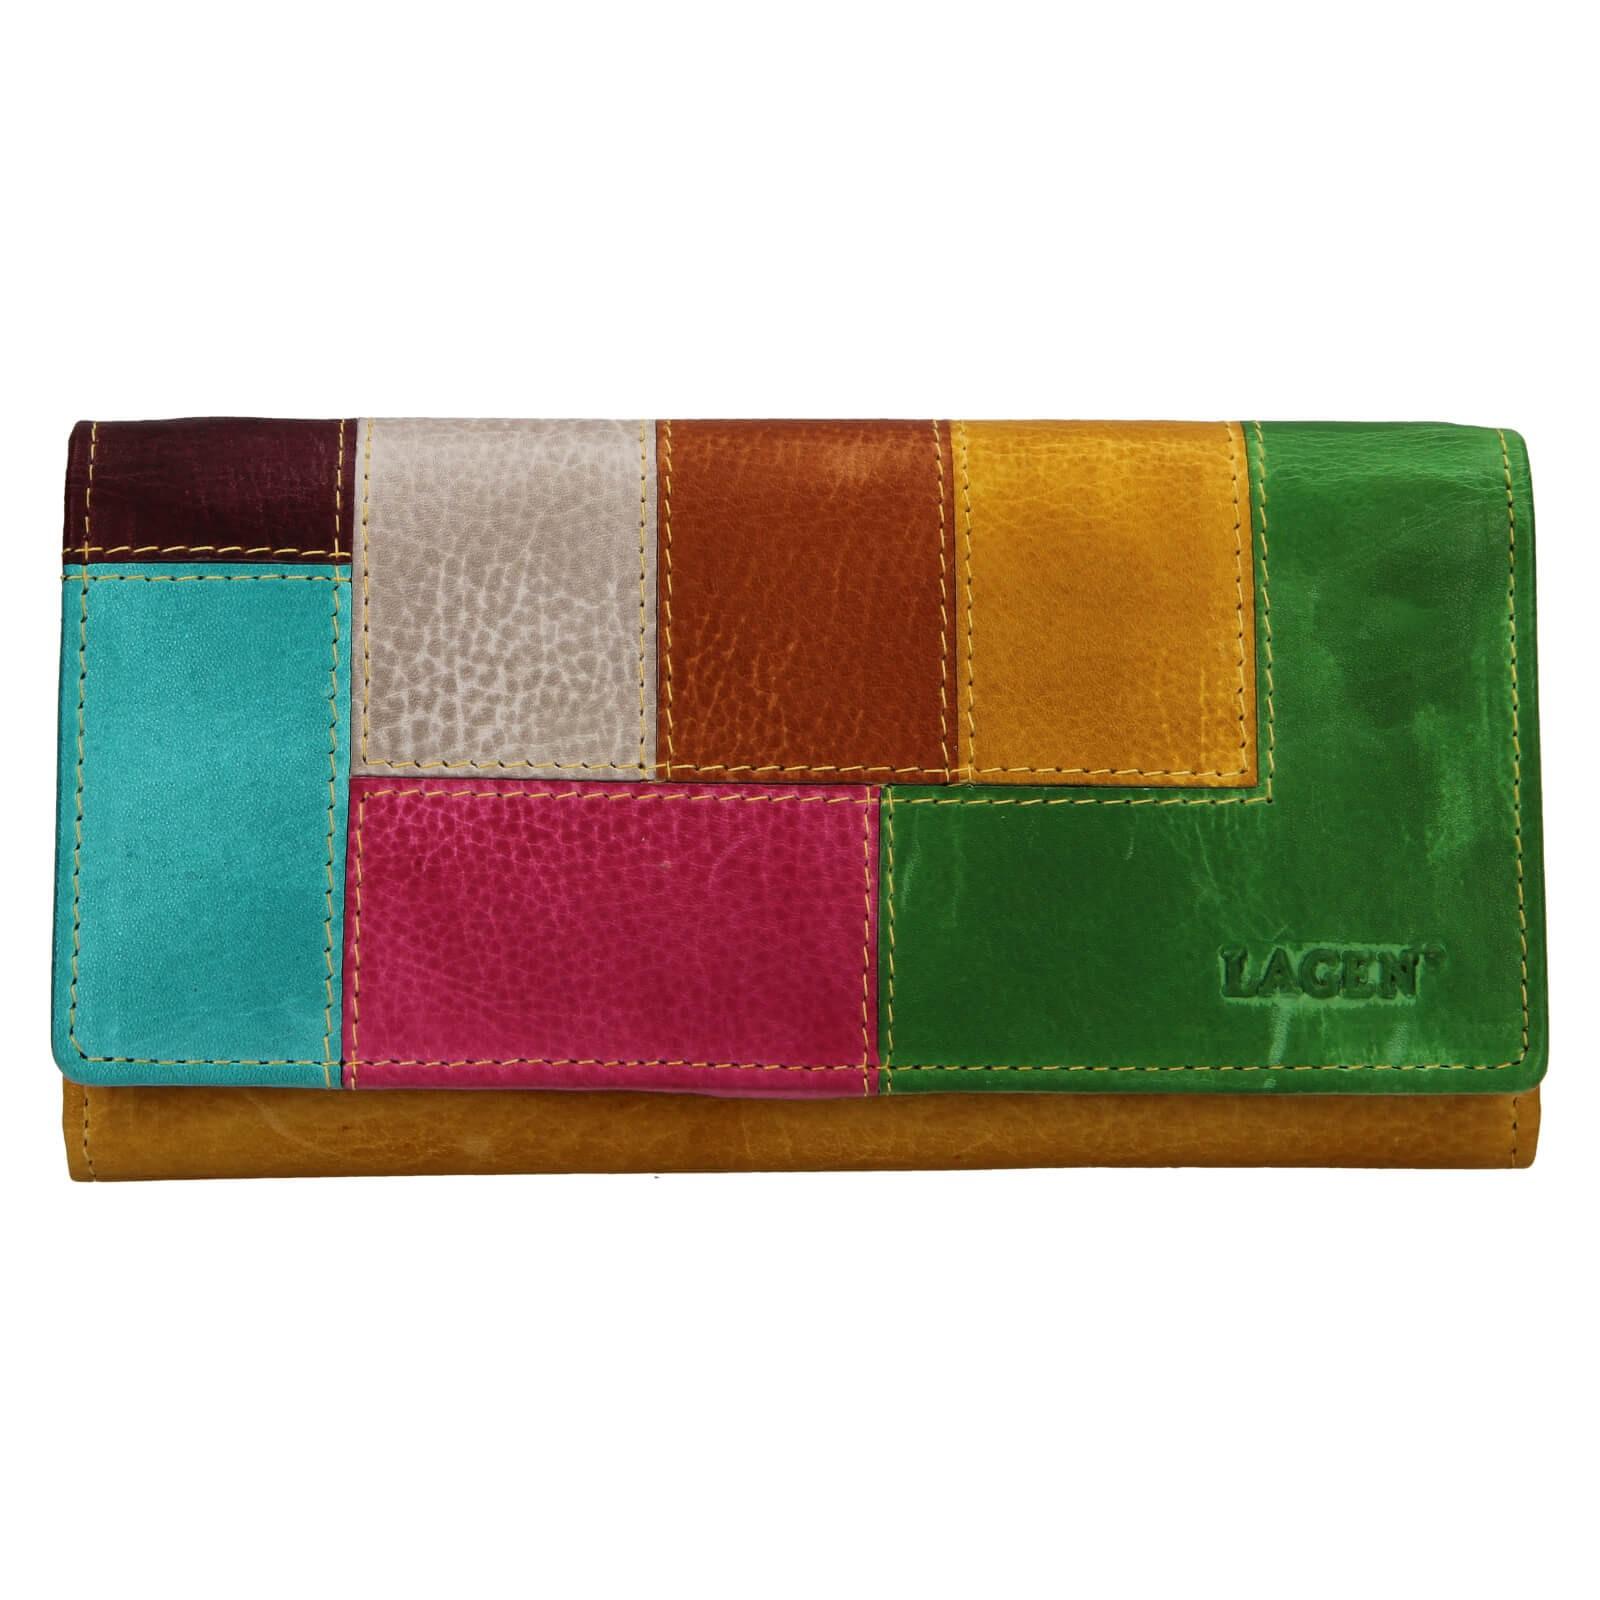 Dámska kožená peňaženka Lagen Petra